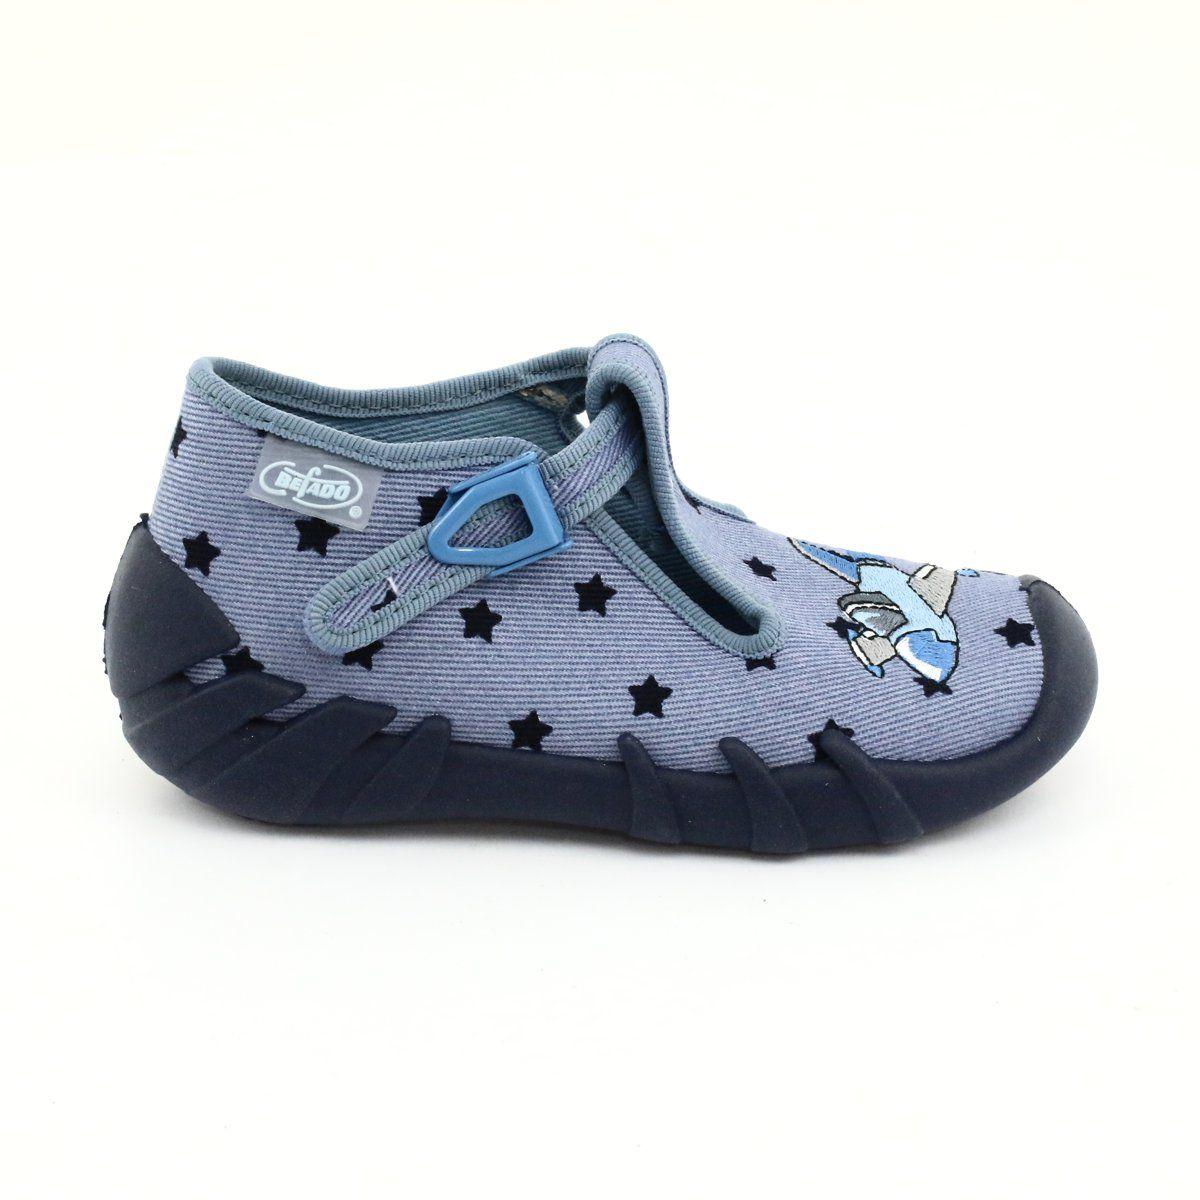 Befado Kolorowe Obuwie Dzieciece 110p345 Niebieskie Childrens Shoes Childrens Slippers Kid Shoes